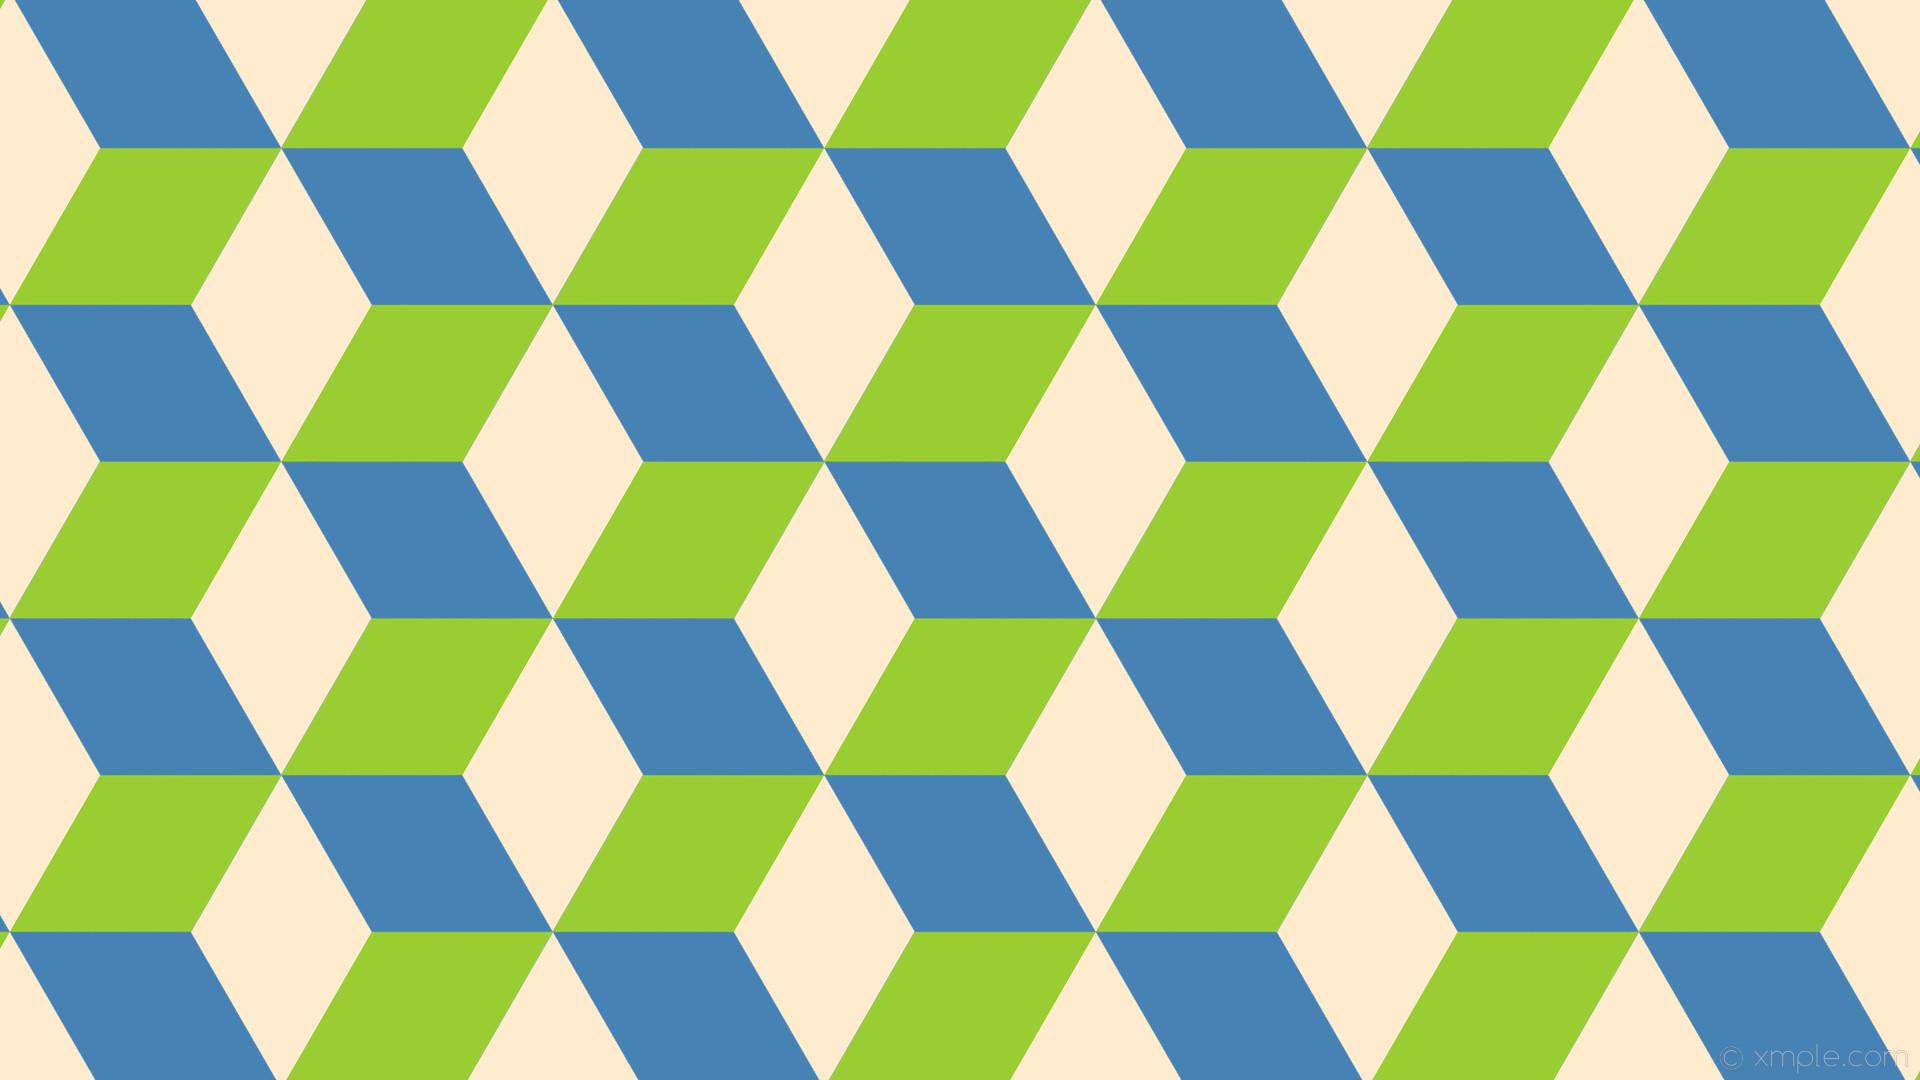 wallpaper brown 3d cubes blue green steel blue blanched almond yellow green  #4682b4 #ffebcd